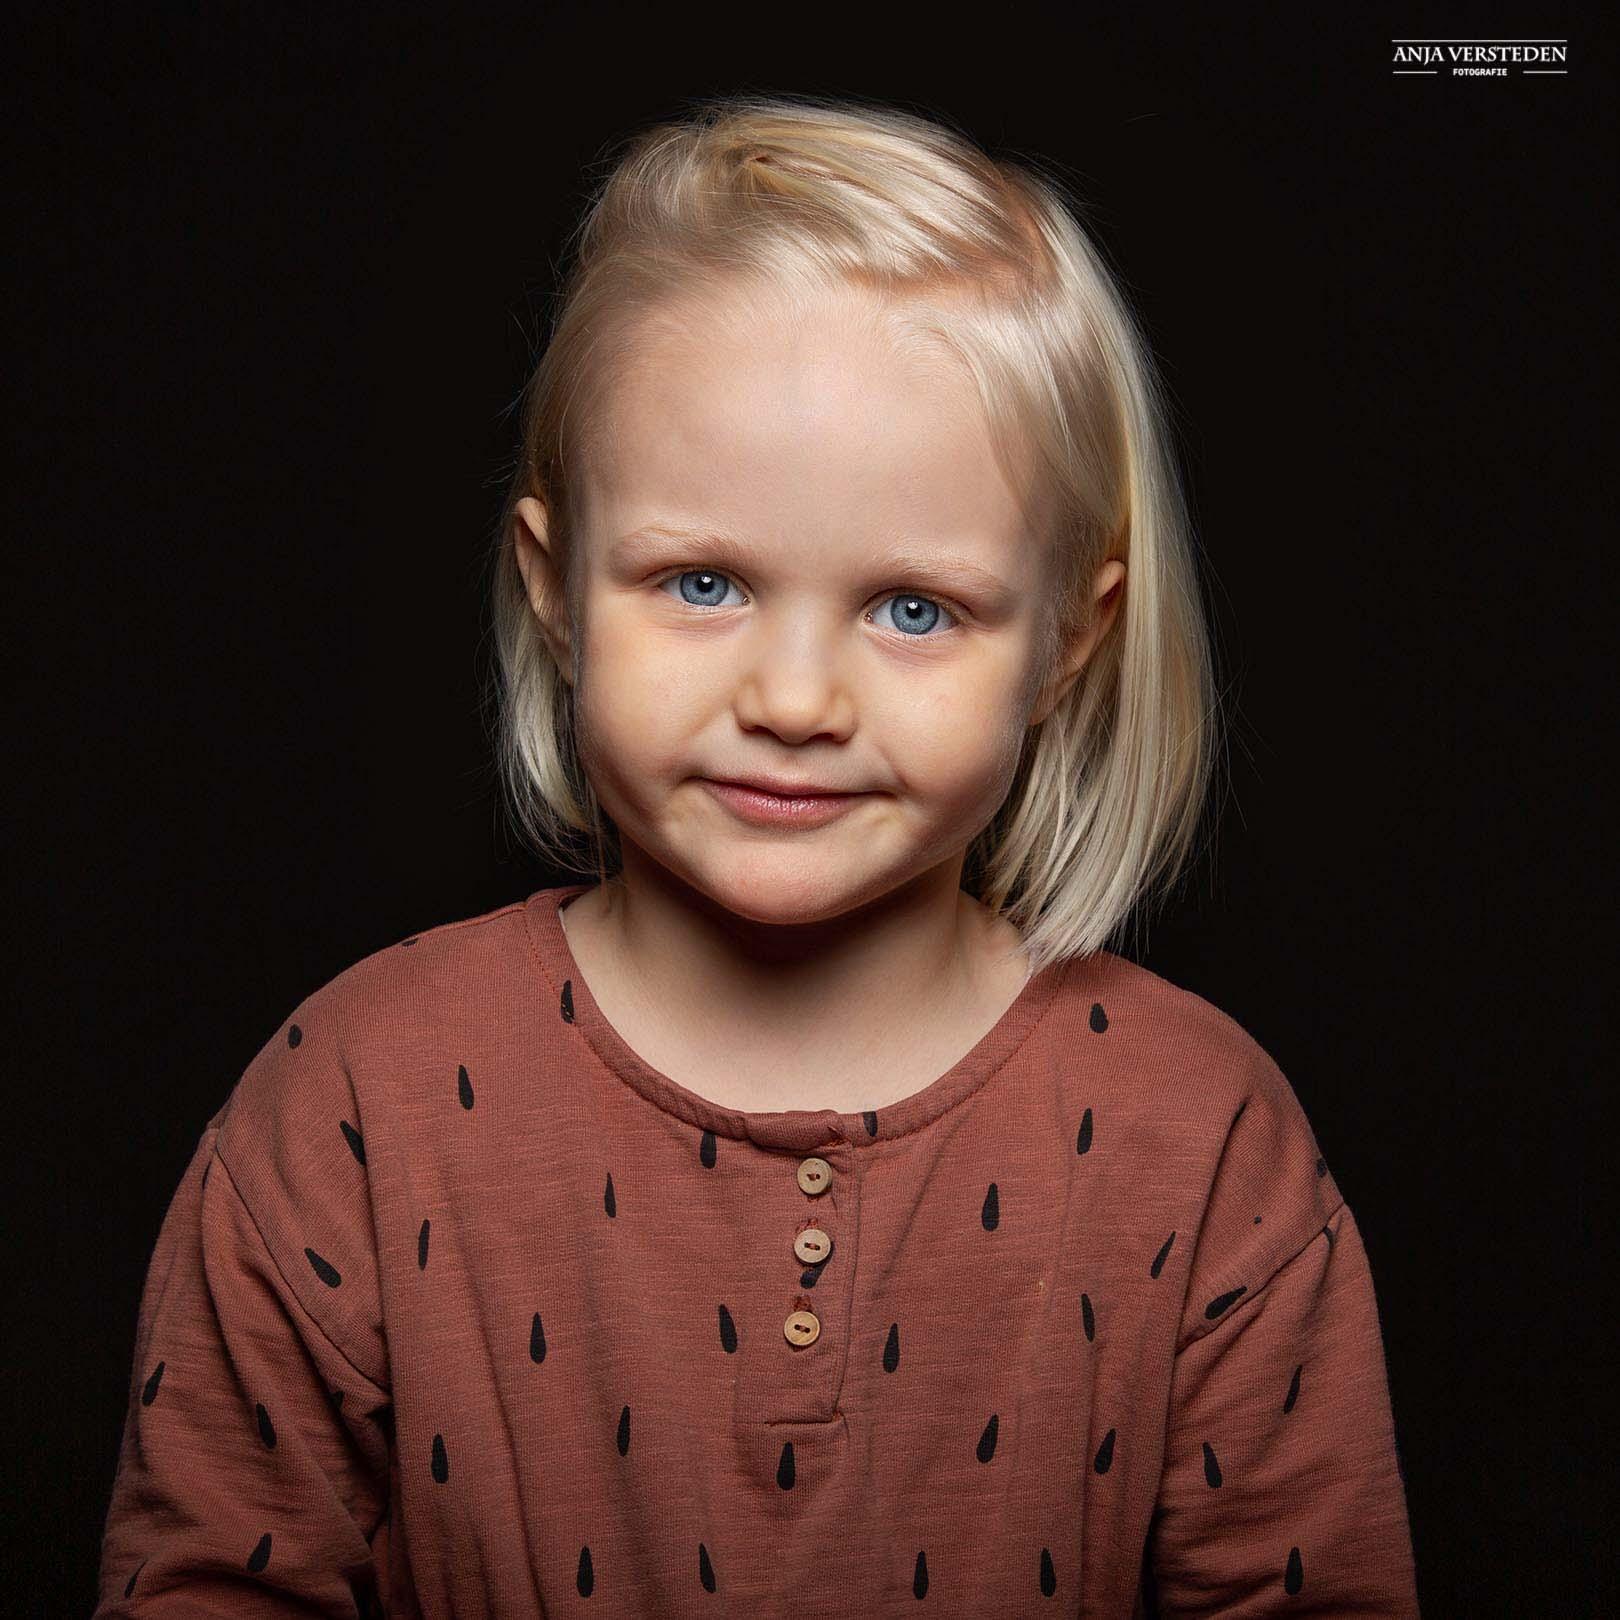 Tijdloos kinderportret kinderfotografie